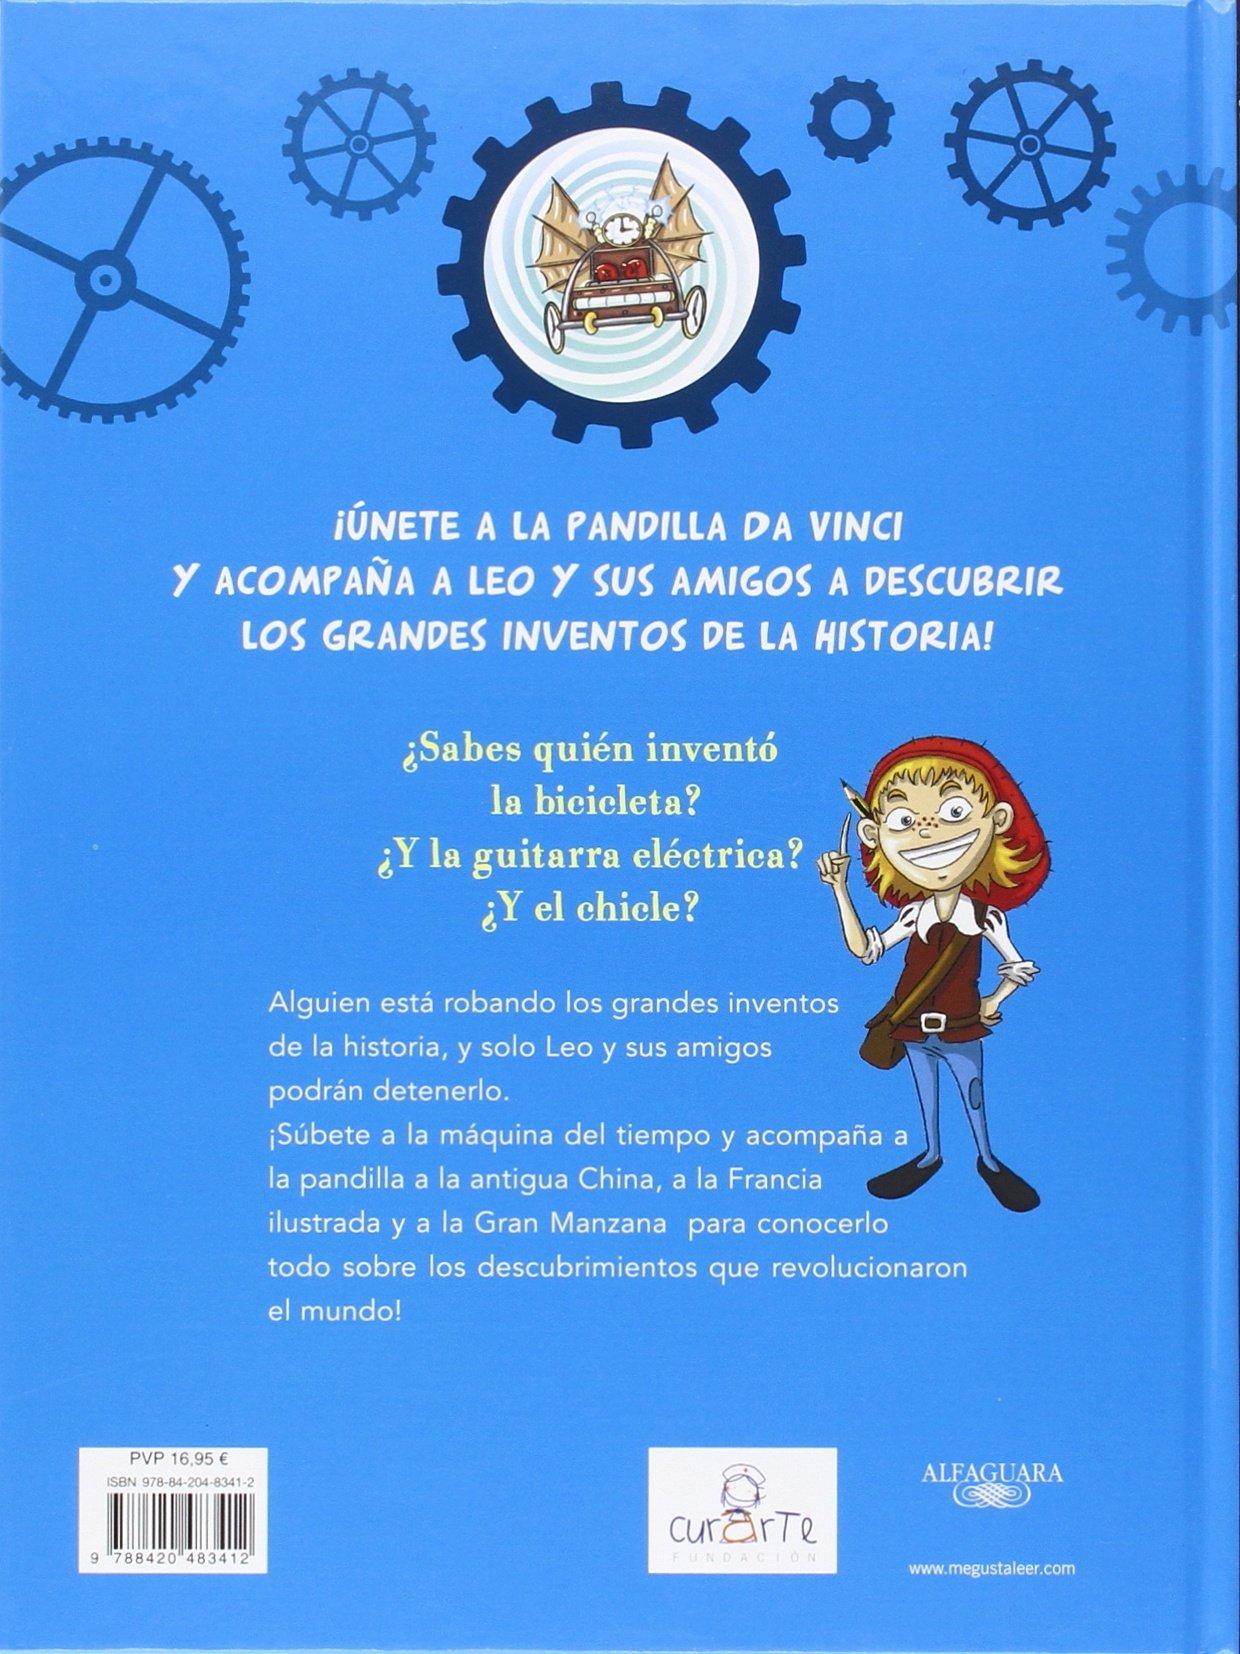 El gran libro de inventos del pequeño Leo Da Vinci (El pequeño Leo Da Vinci): CHRISTIAN GALVEZ: 9788420483412: Amazon.com: Books